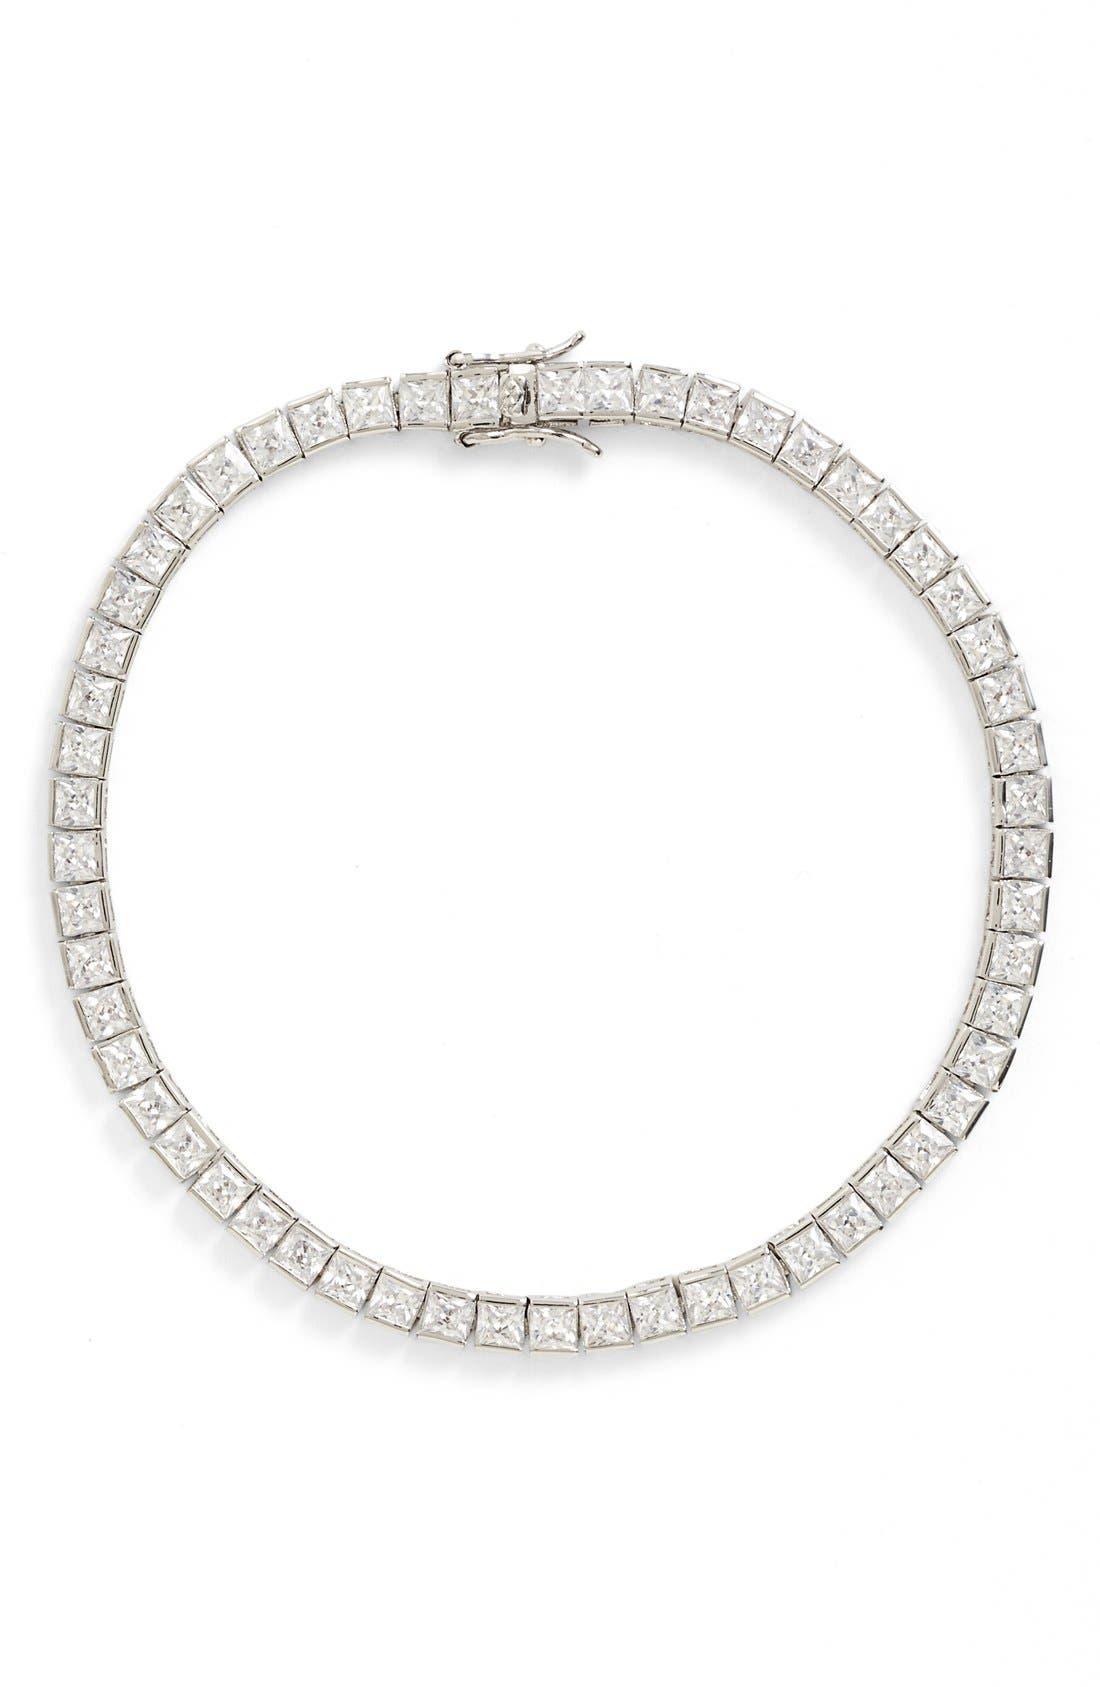 Alternate Image 1 Selected - Nina Cubic Zirconia Tennis Bracelet